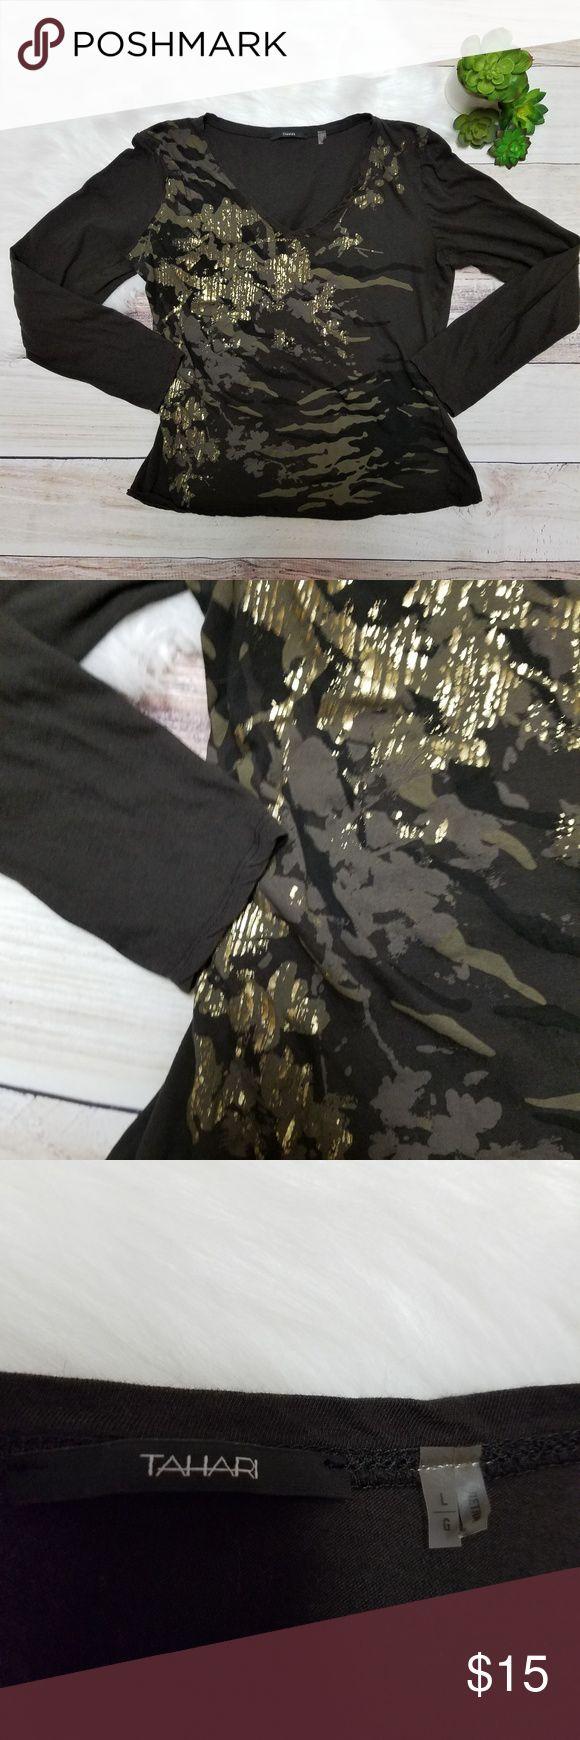 "Tahari brown metallic long sleeve top Tahari brown metallic long sleeve top. Women's size large. 100% cotton. NWOT. Bust: 18"" laid flat Length: 20"" Tahari Tops Tees - Long Sleeve"